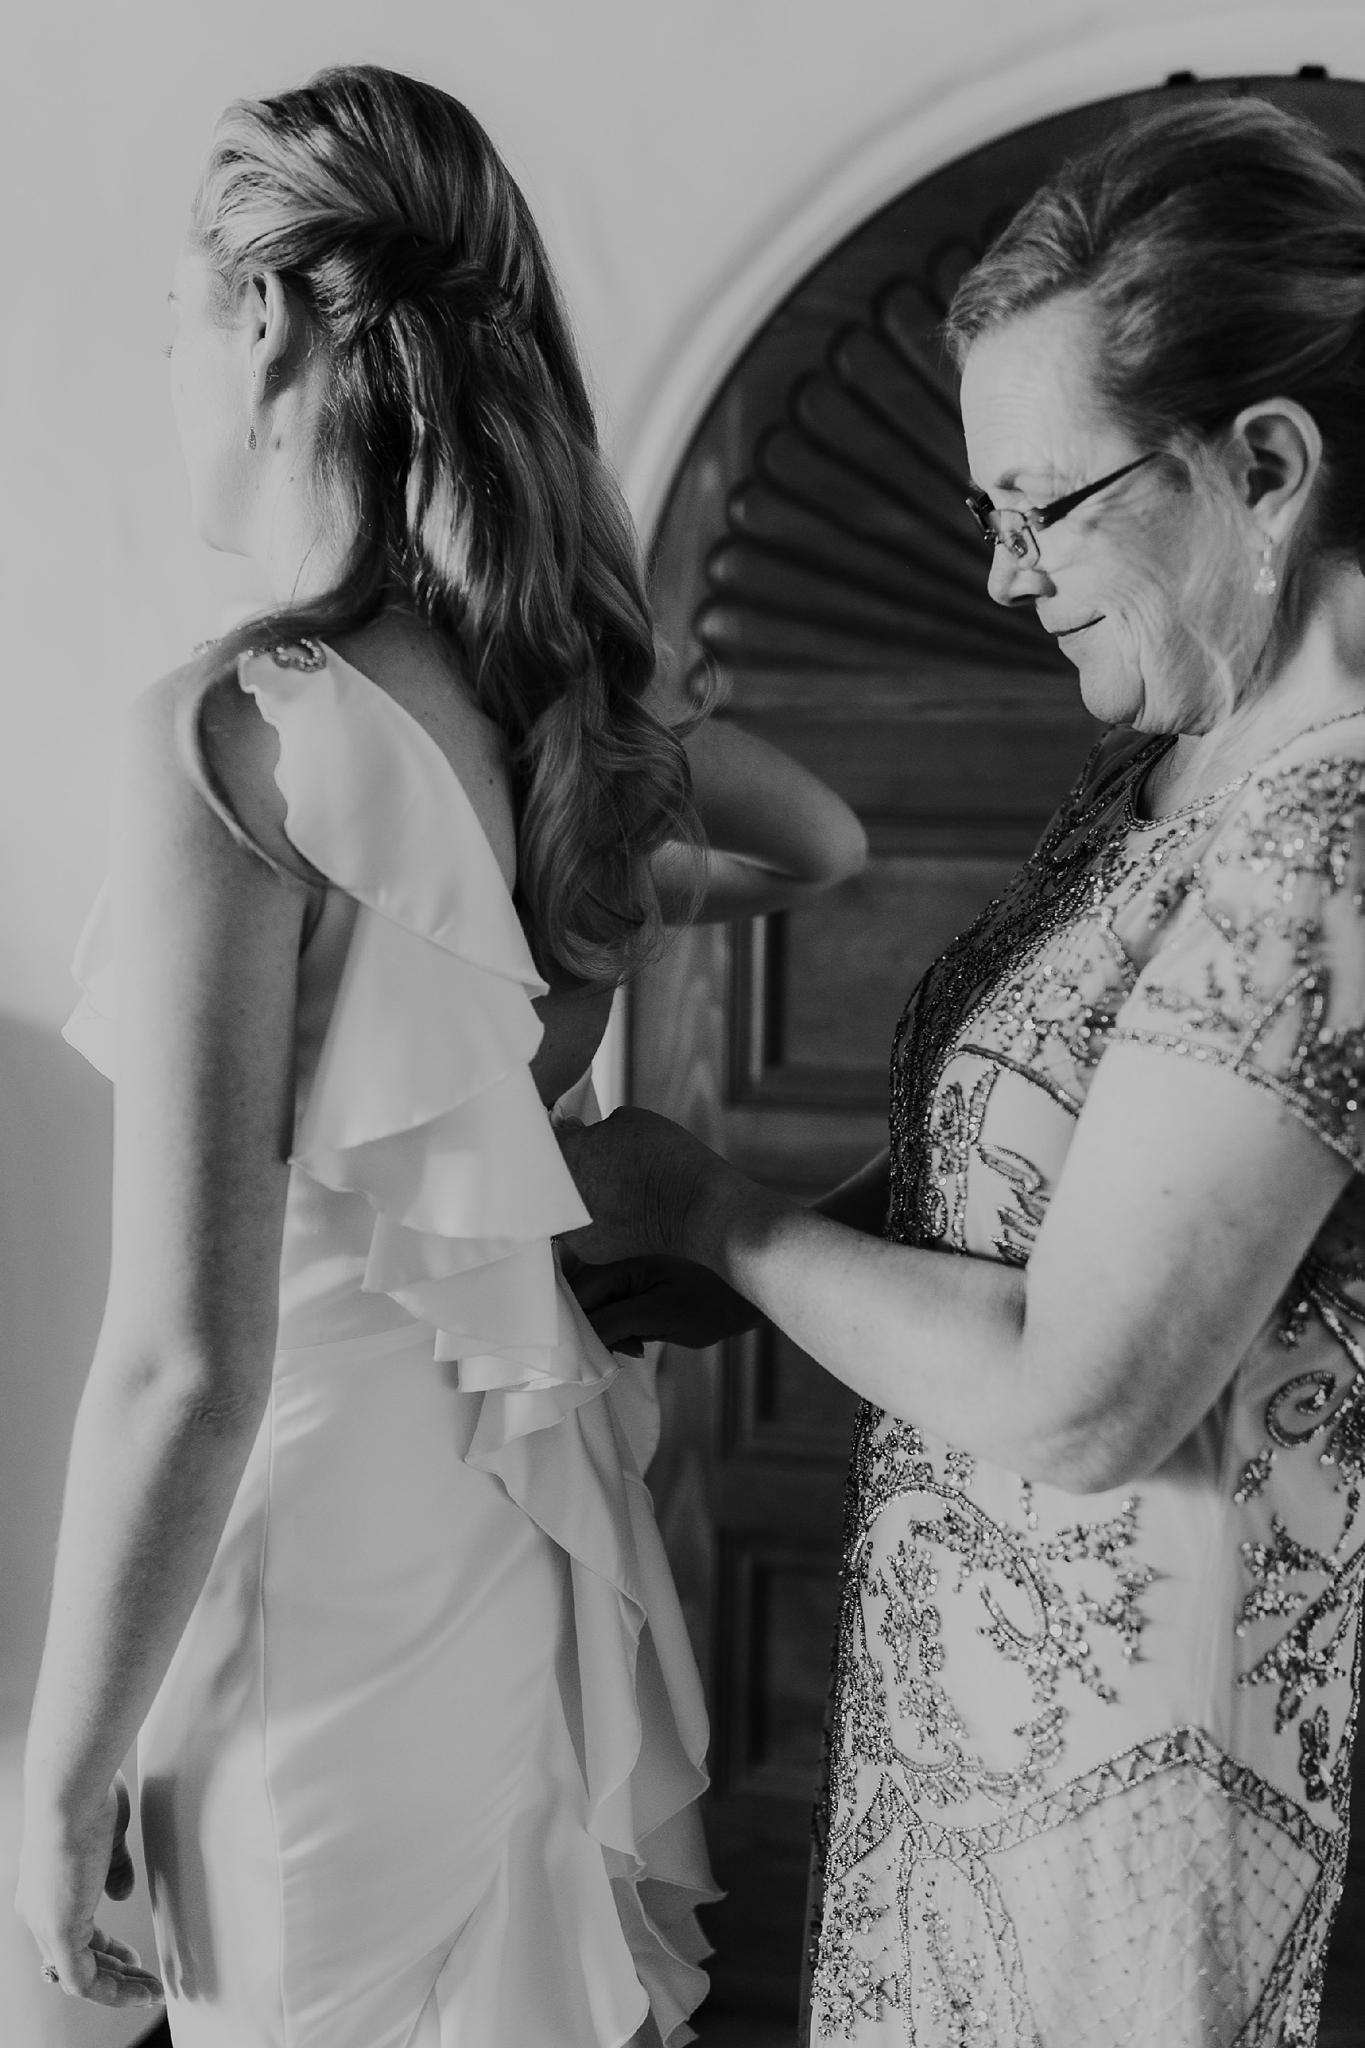 Alicia+lucia+photography+-+albuquerque+wedding+photographer+-+santa+fe+wedding+photography+-+new+mexico+wedding+photographer+-+new+mexico+wedding+-+family+photographer+-+mothers+day+-+mother+of+the+bride_0056.jpg